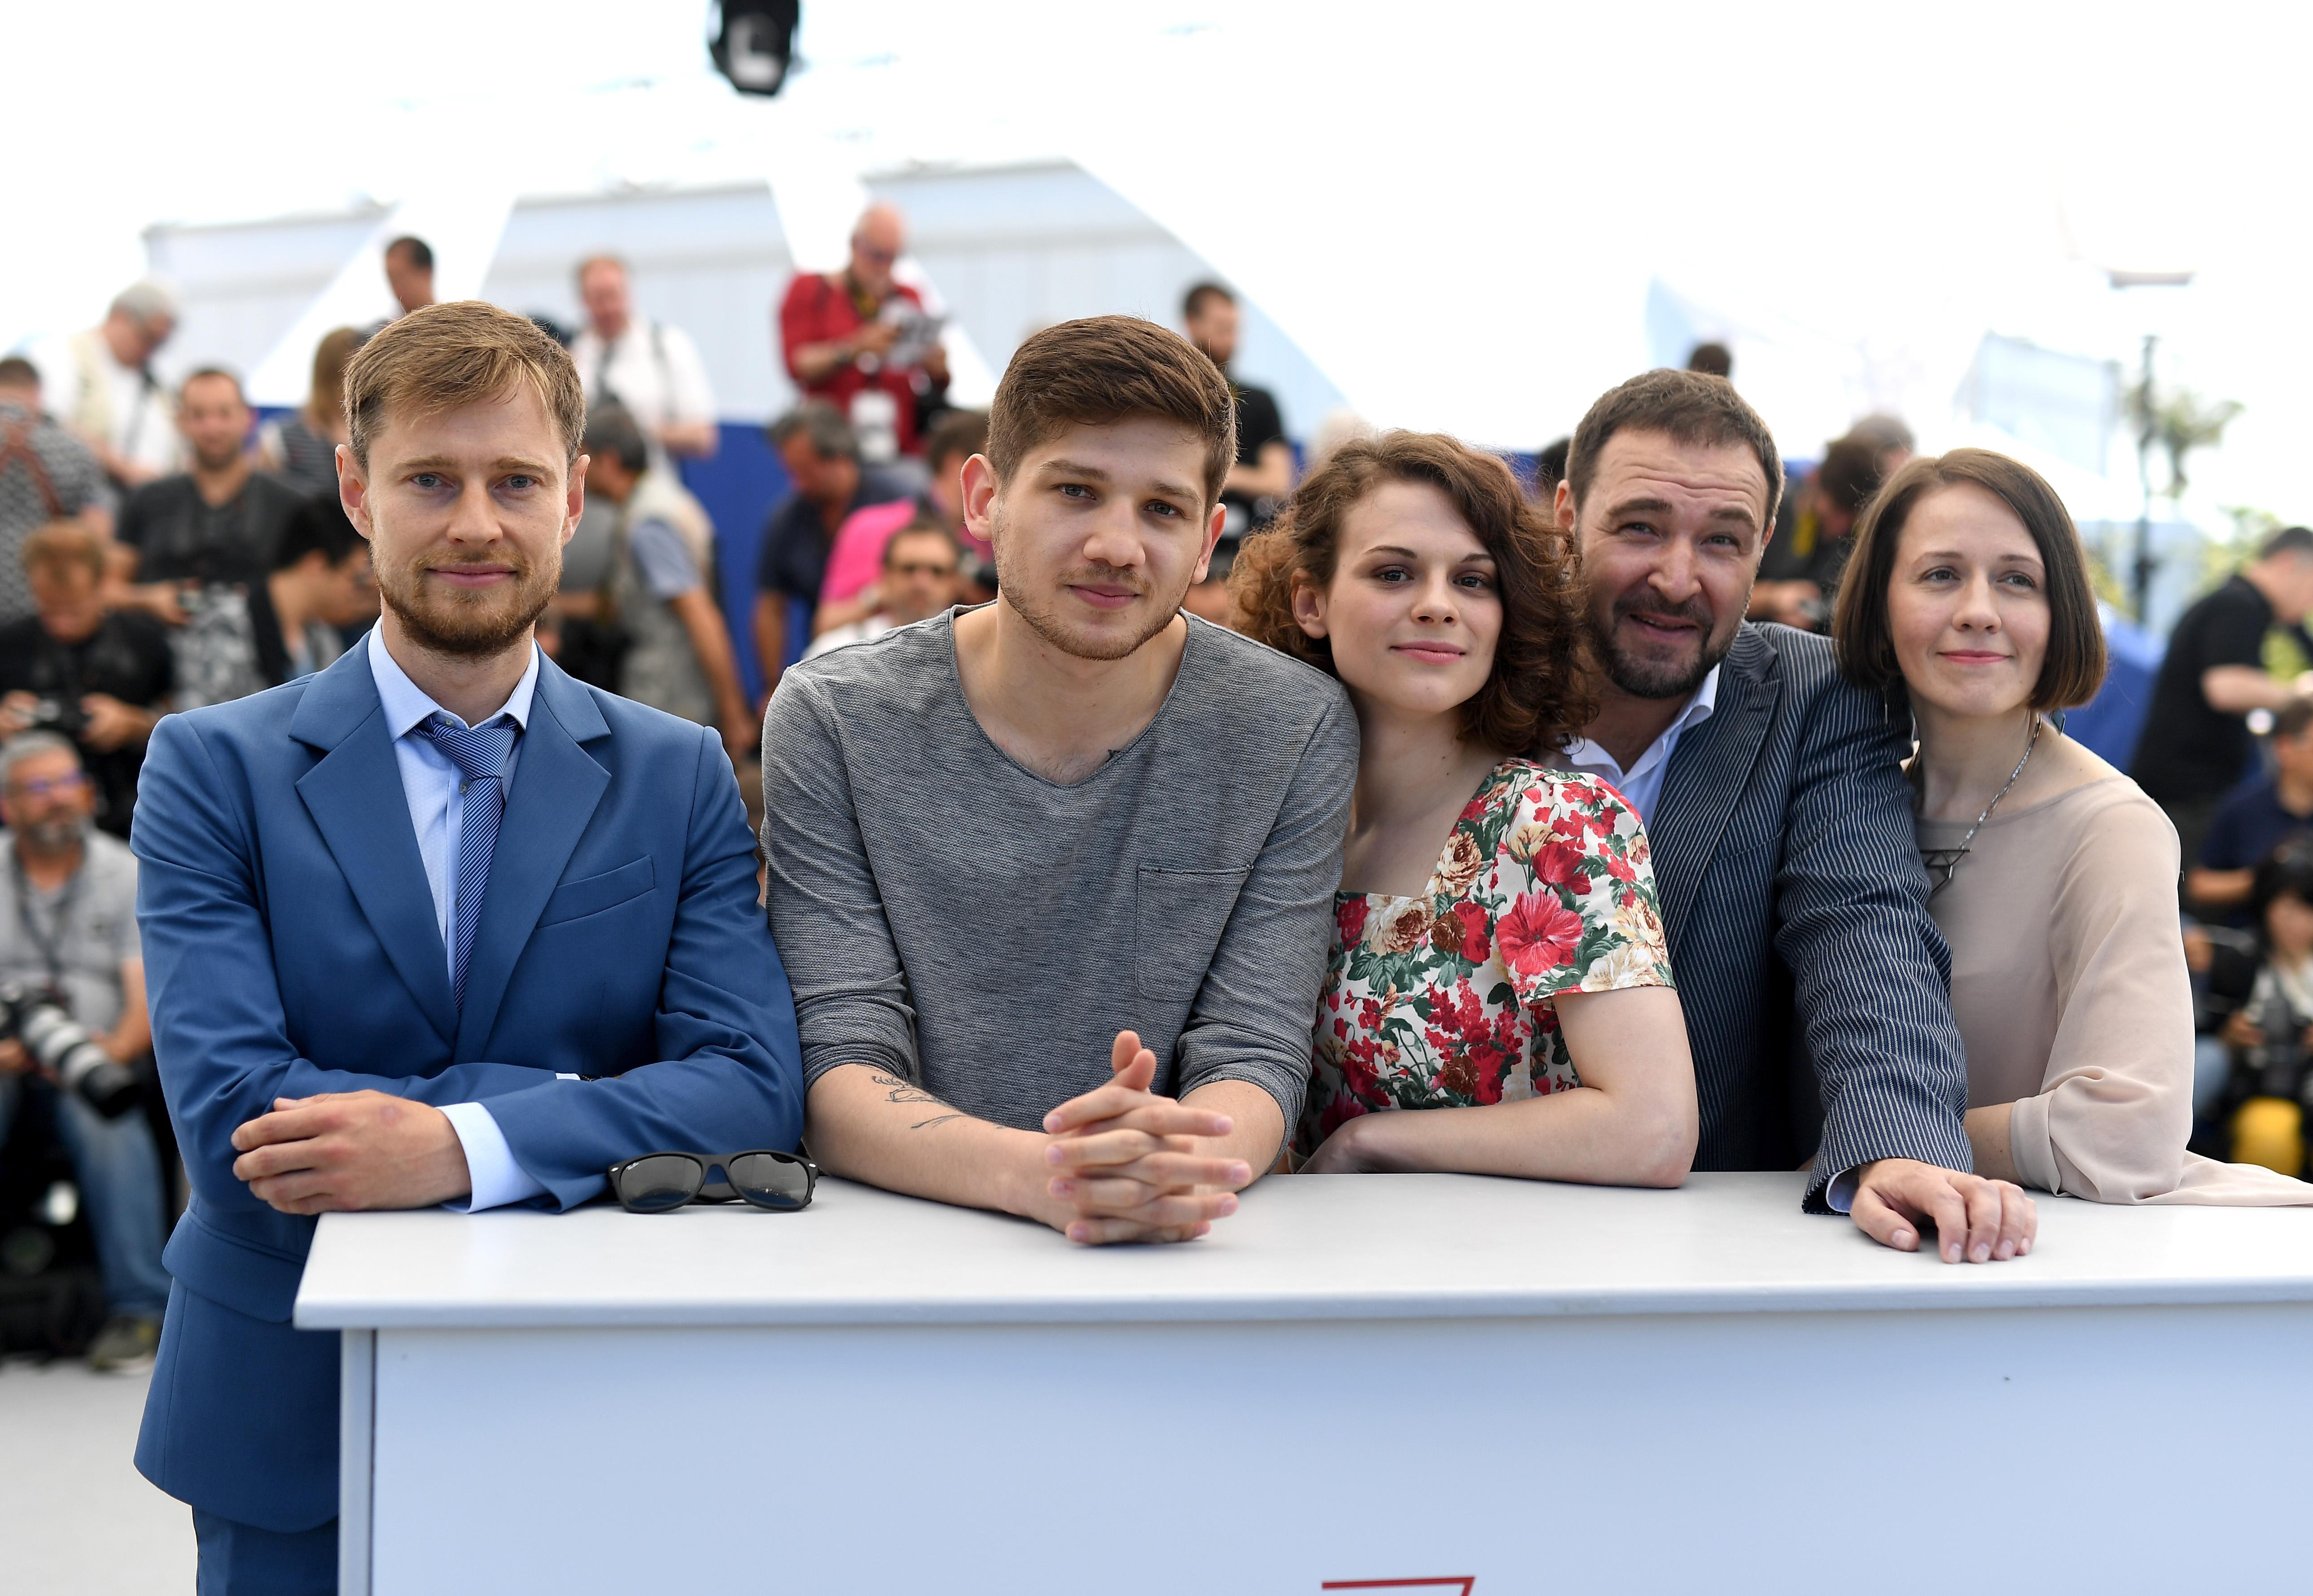 Николай Янкин, Кантемир Балагов, Дарья Жовнер,Ольга Драгунова, Артем Цыпин